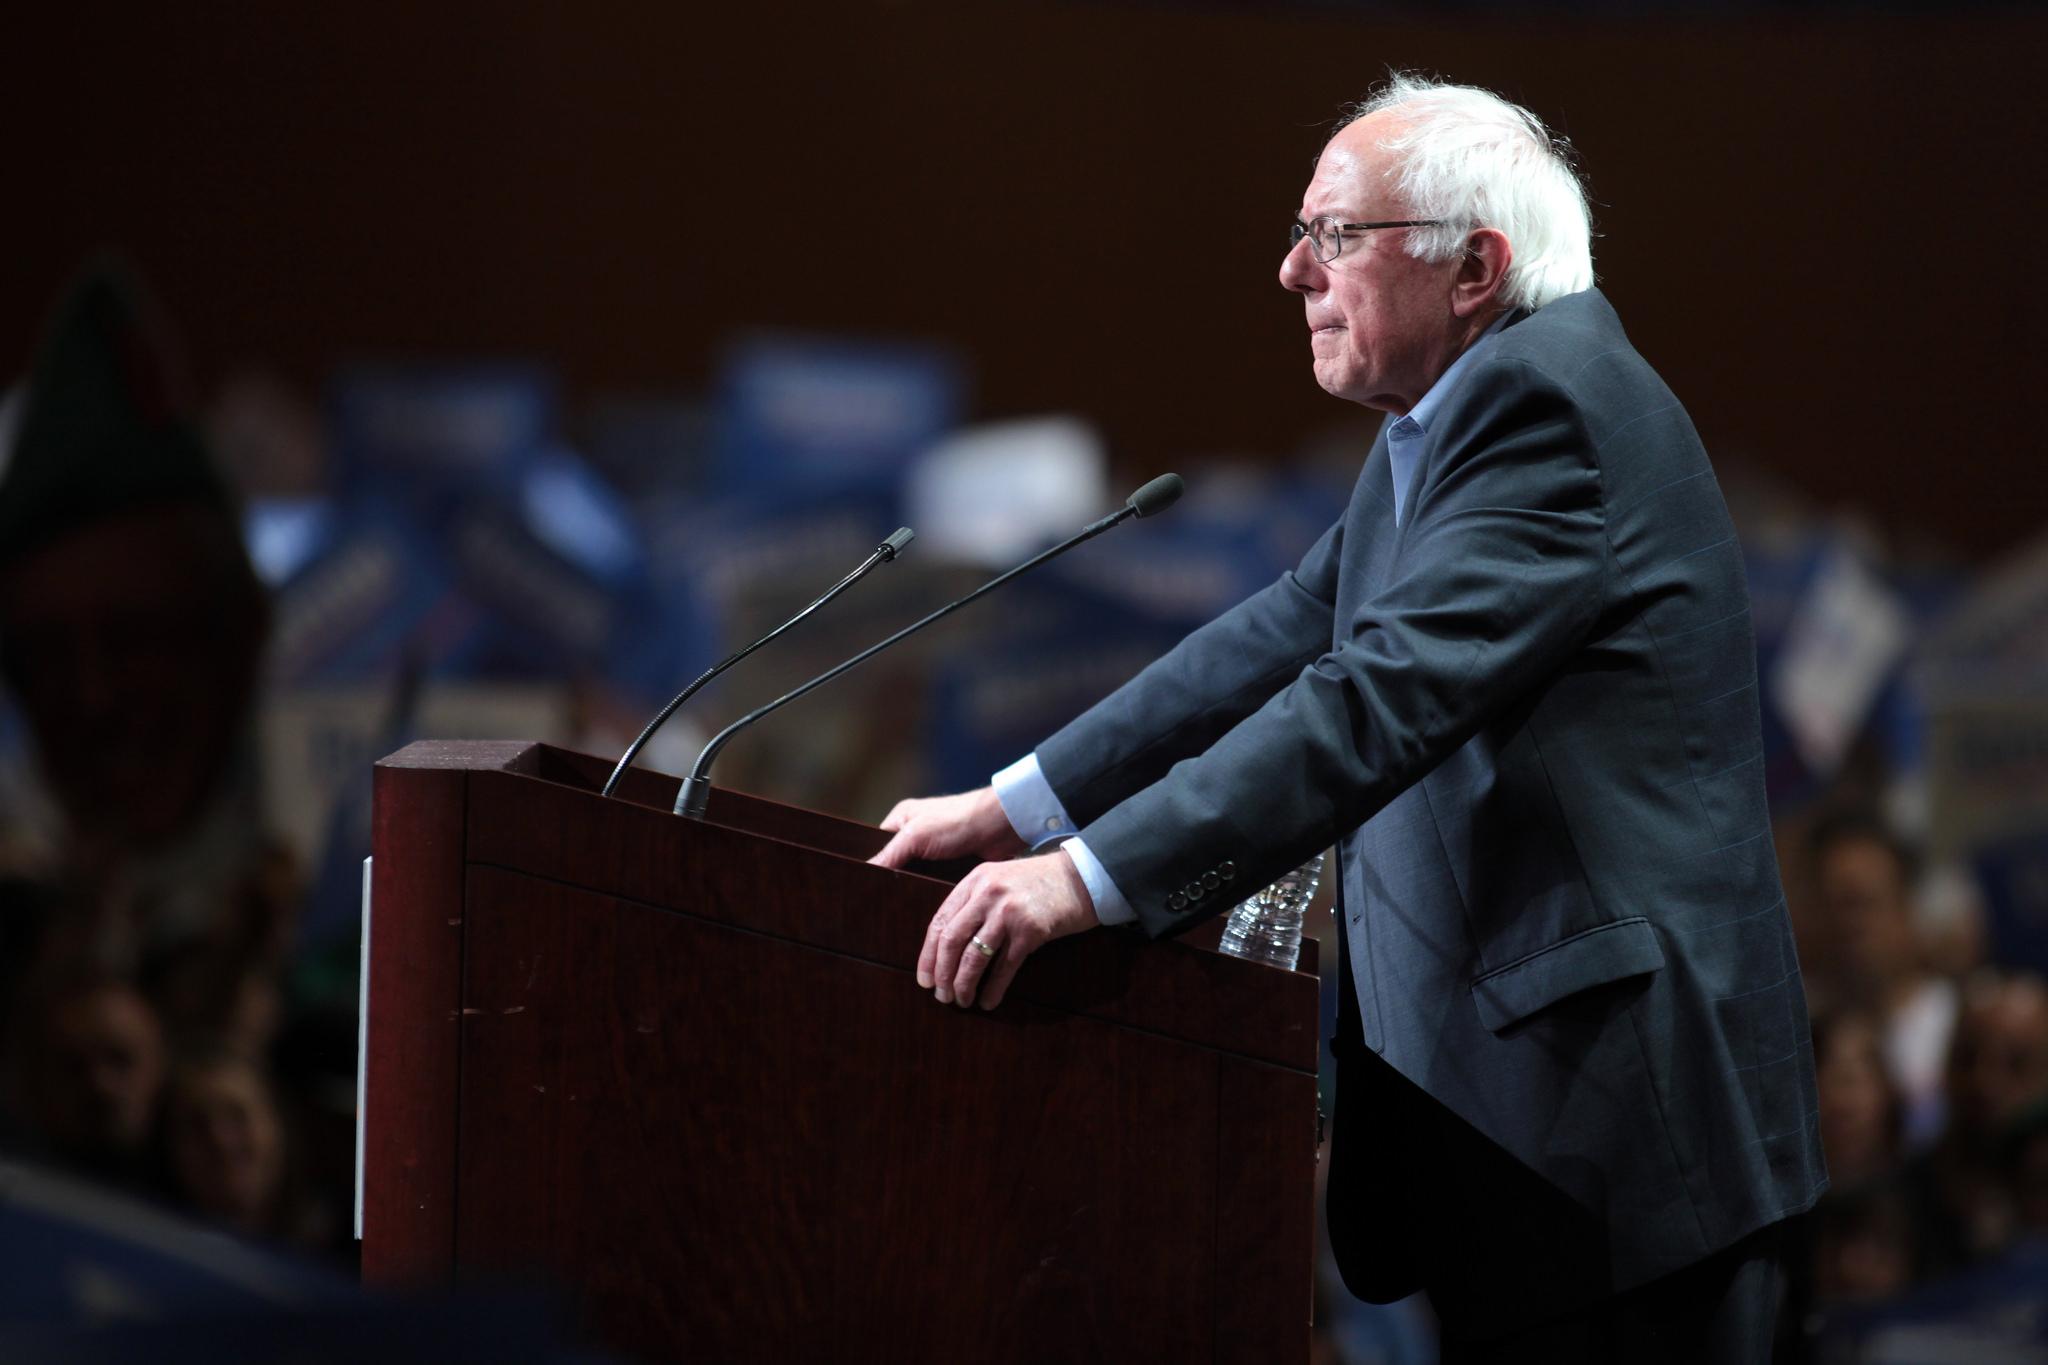 Bernie Sanders Isn't Just Anti-Capitalist. Now He's a Voice Against Militarism, Too.